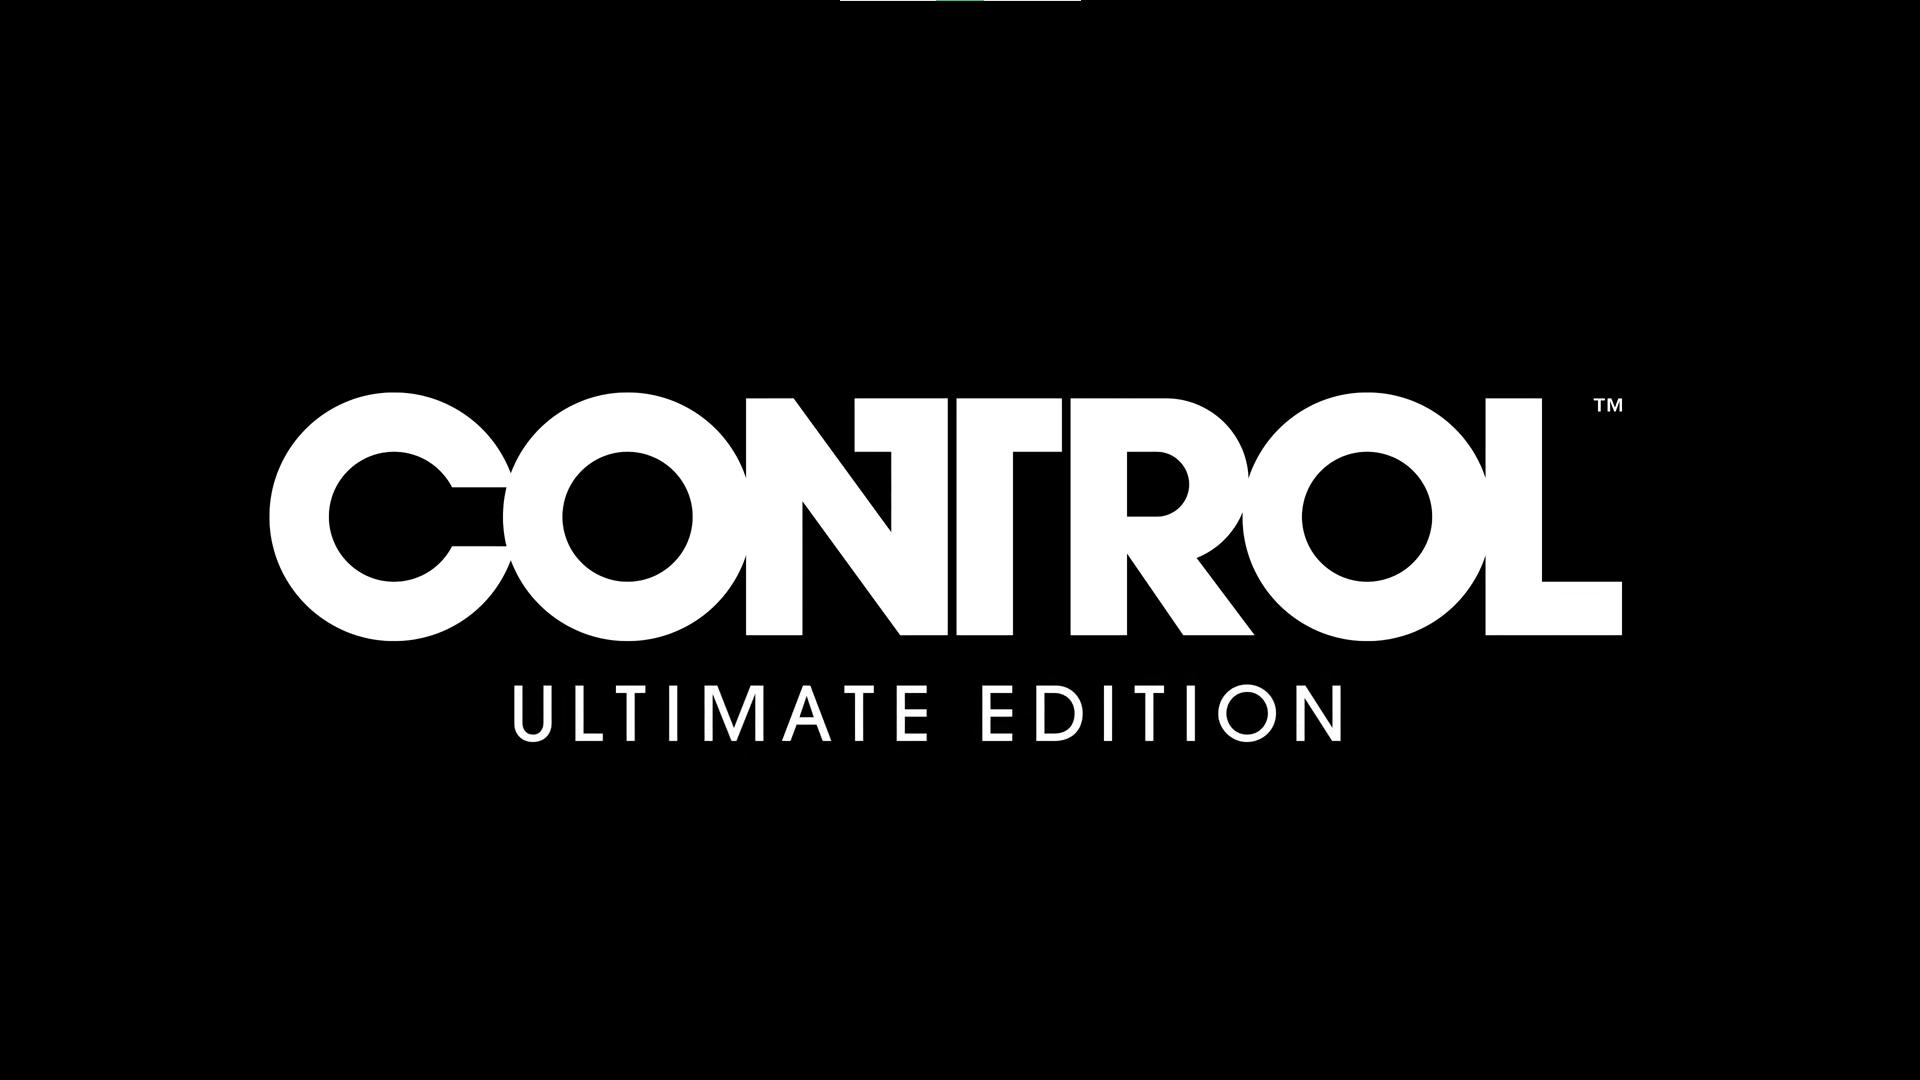 Control Ultimate Edition wallpaper